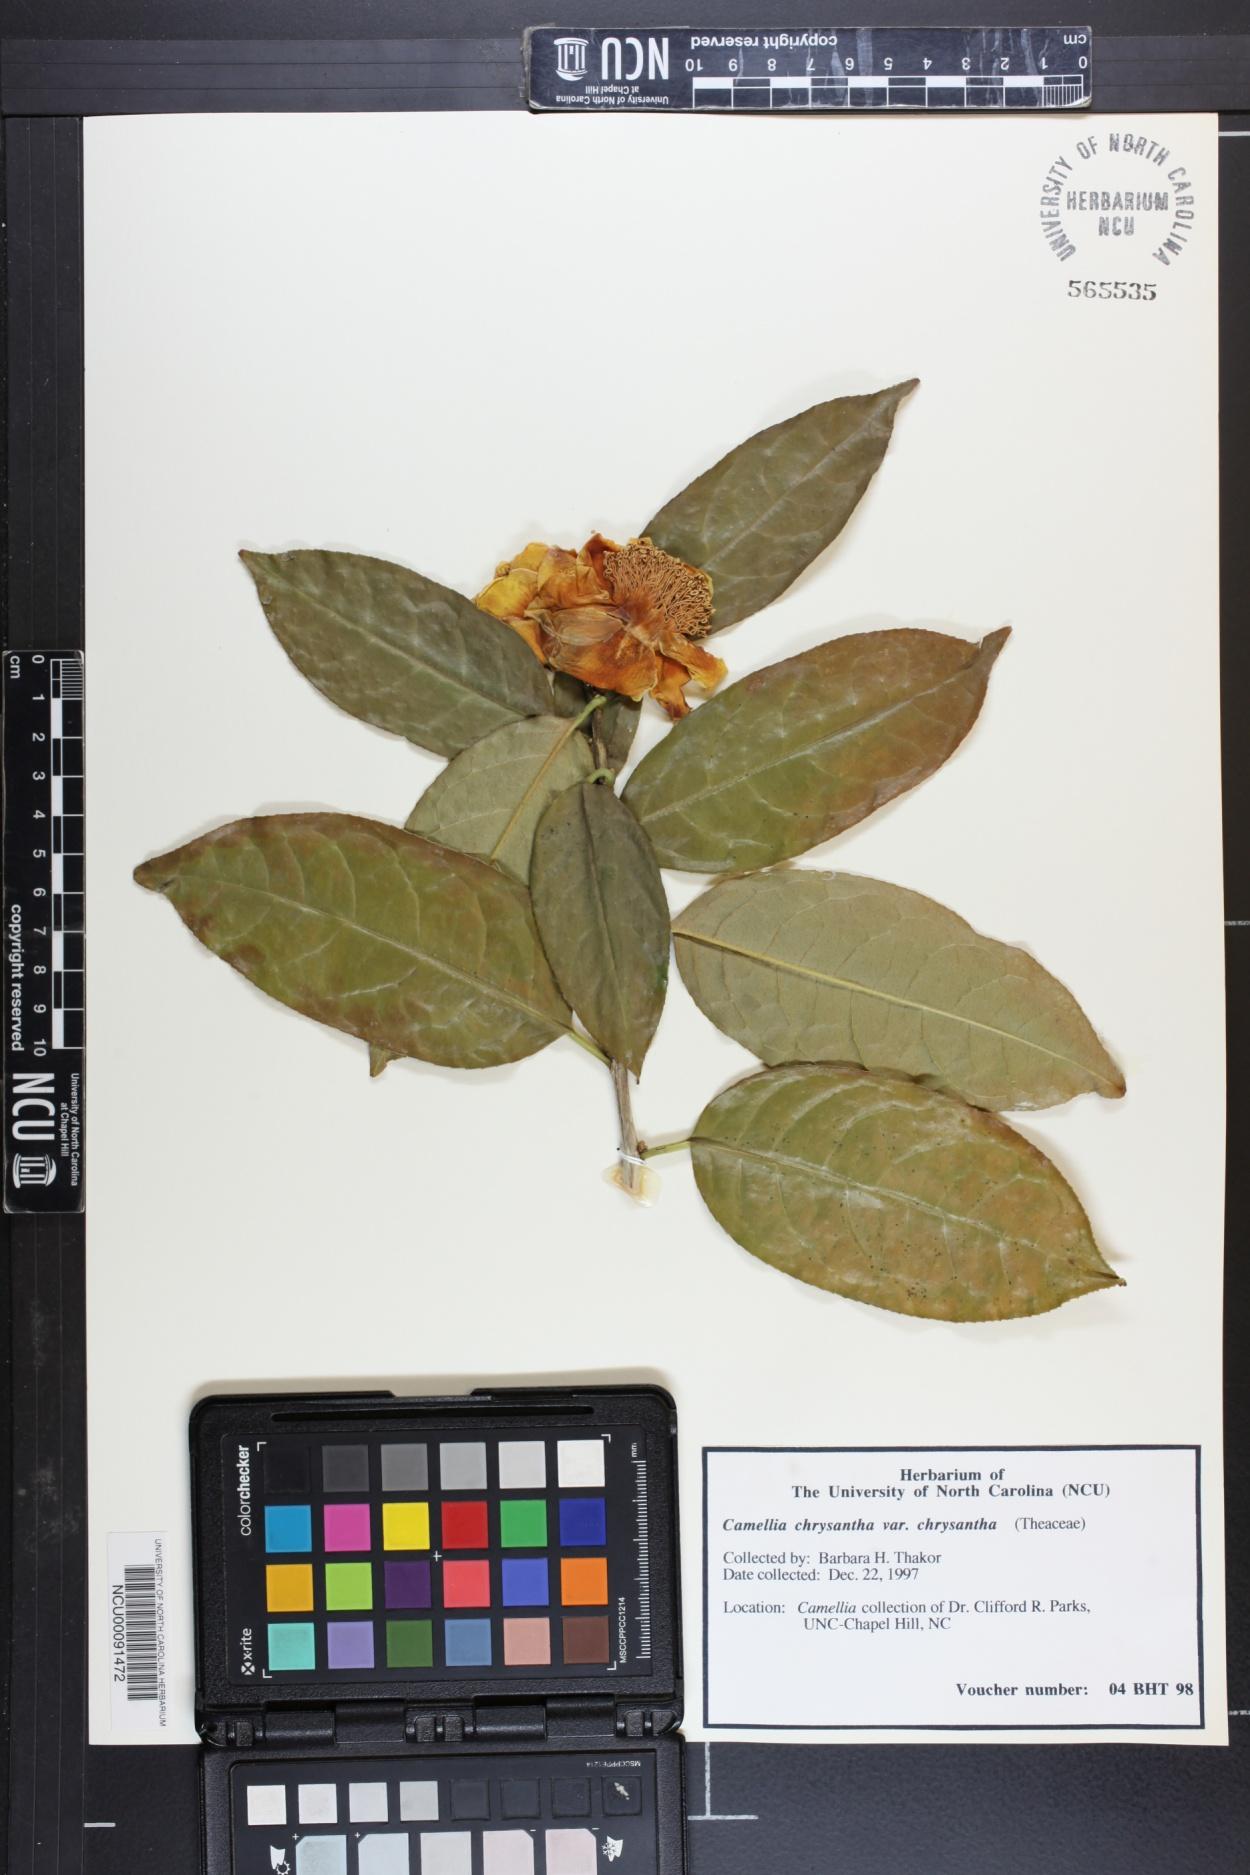 Camellia chrysantha image